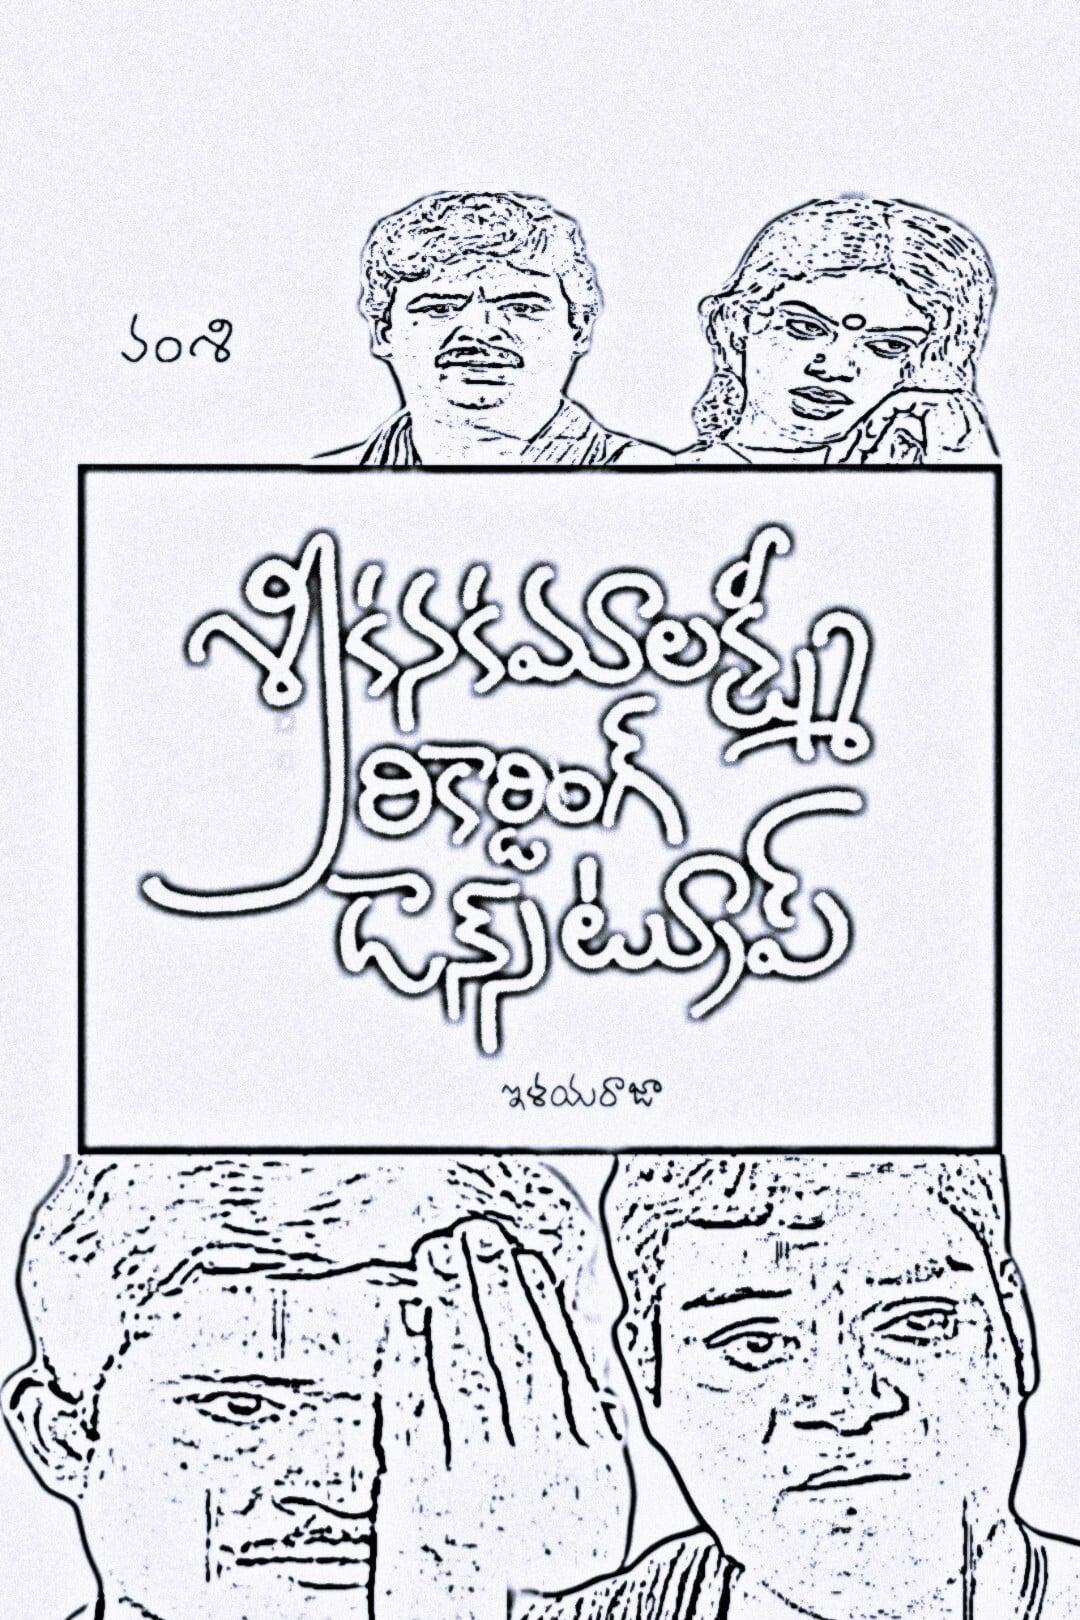 Sri Kanaka Mahalakshmi Recording Dance Troope